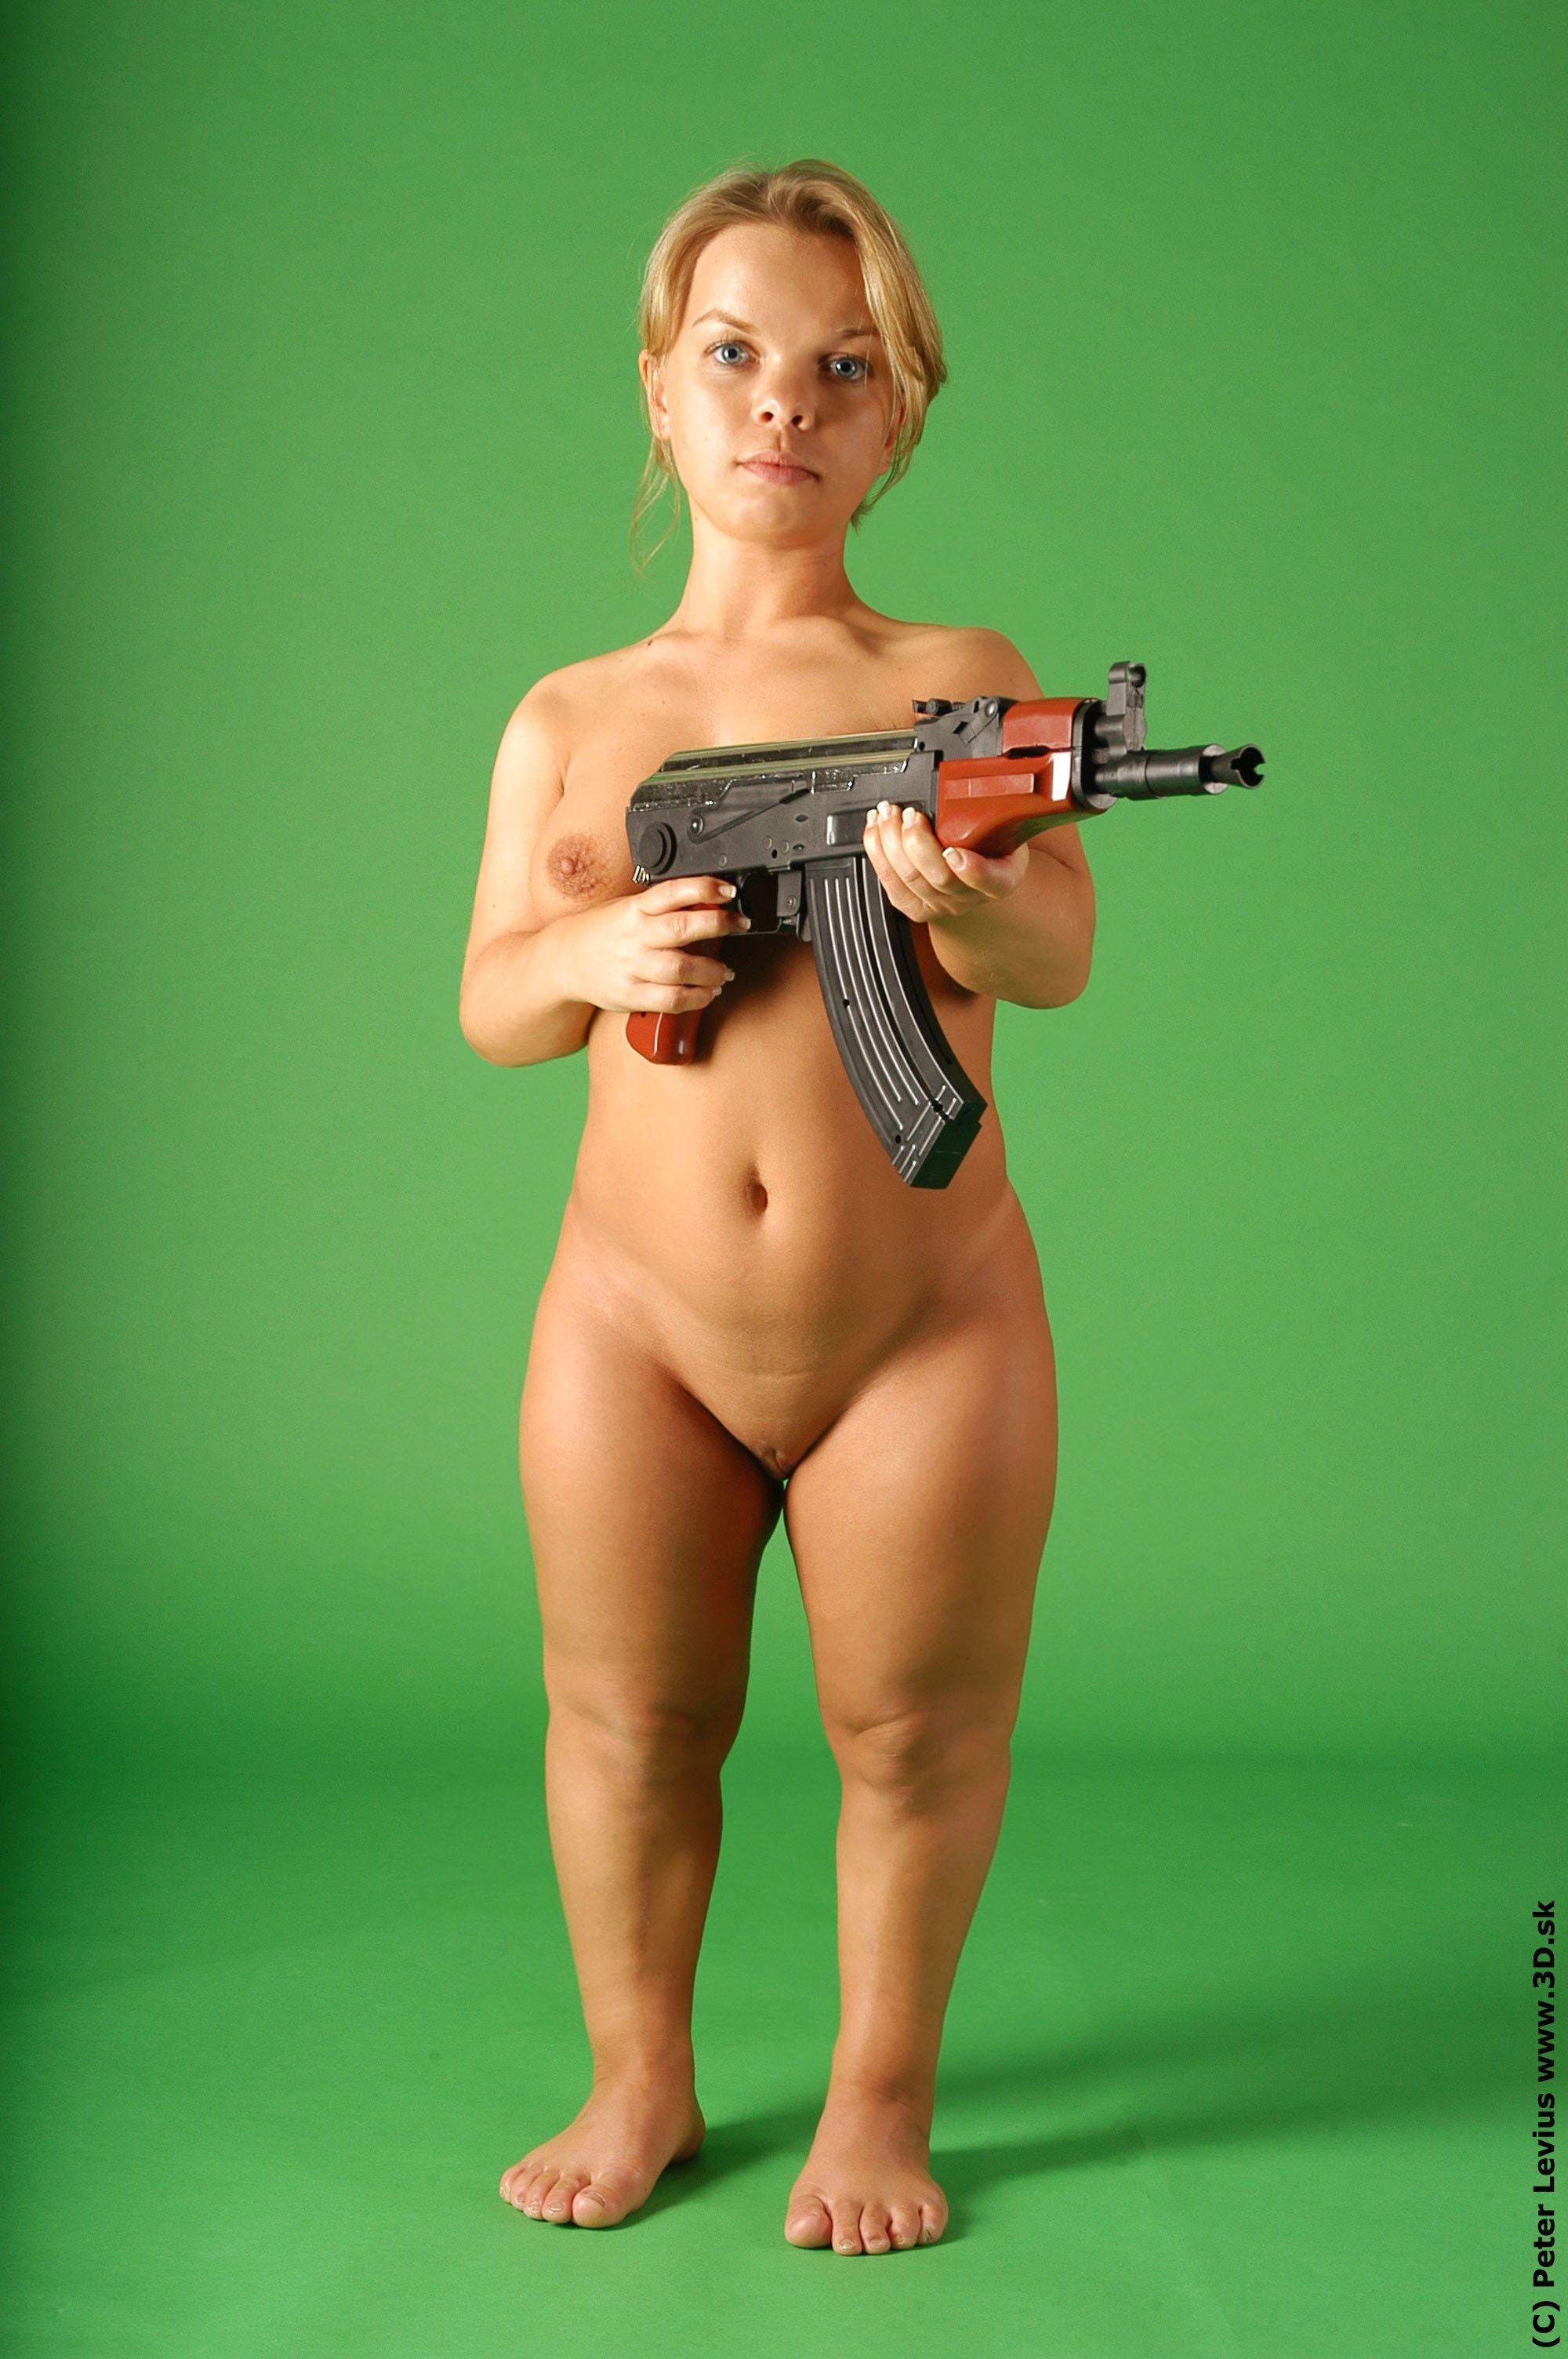 Dwarf naked ladies porno picture